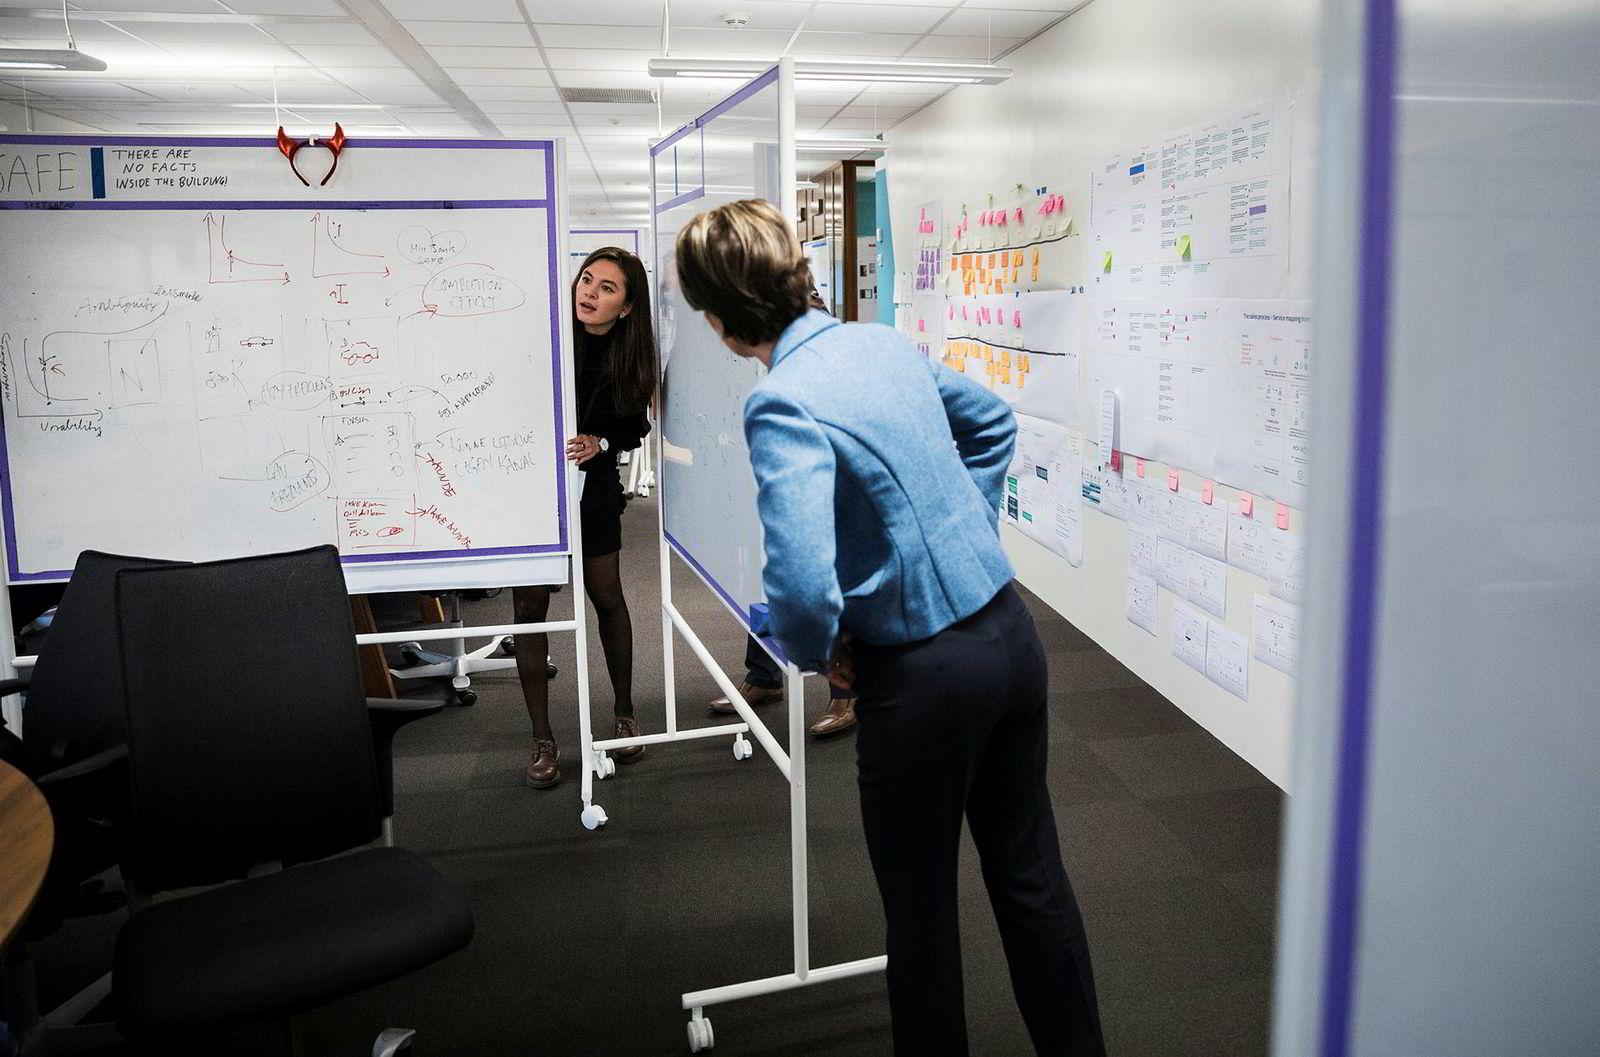 Negina Mamadova (til venstre) viser direktør Liv Fiksdahl et prosjekt hun jobber med på DNBs «Digital floor».